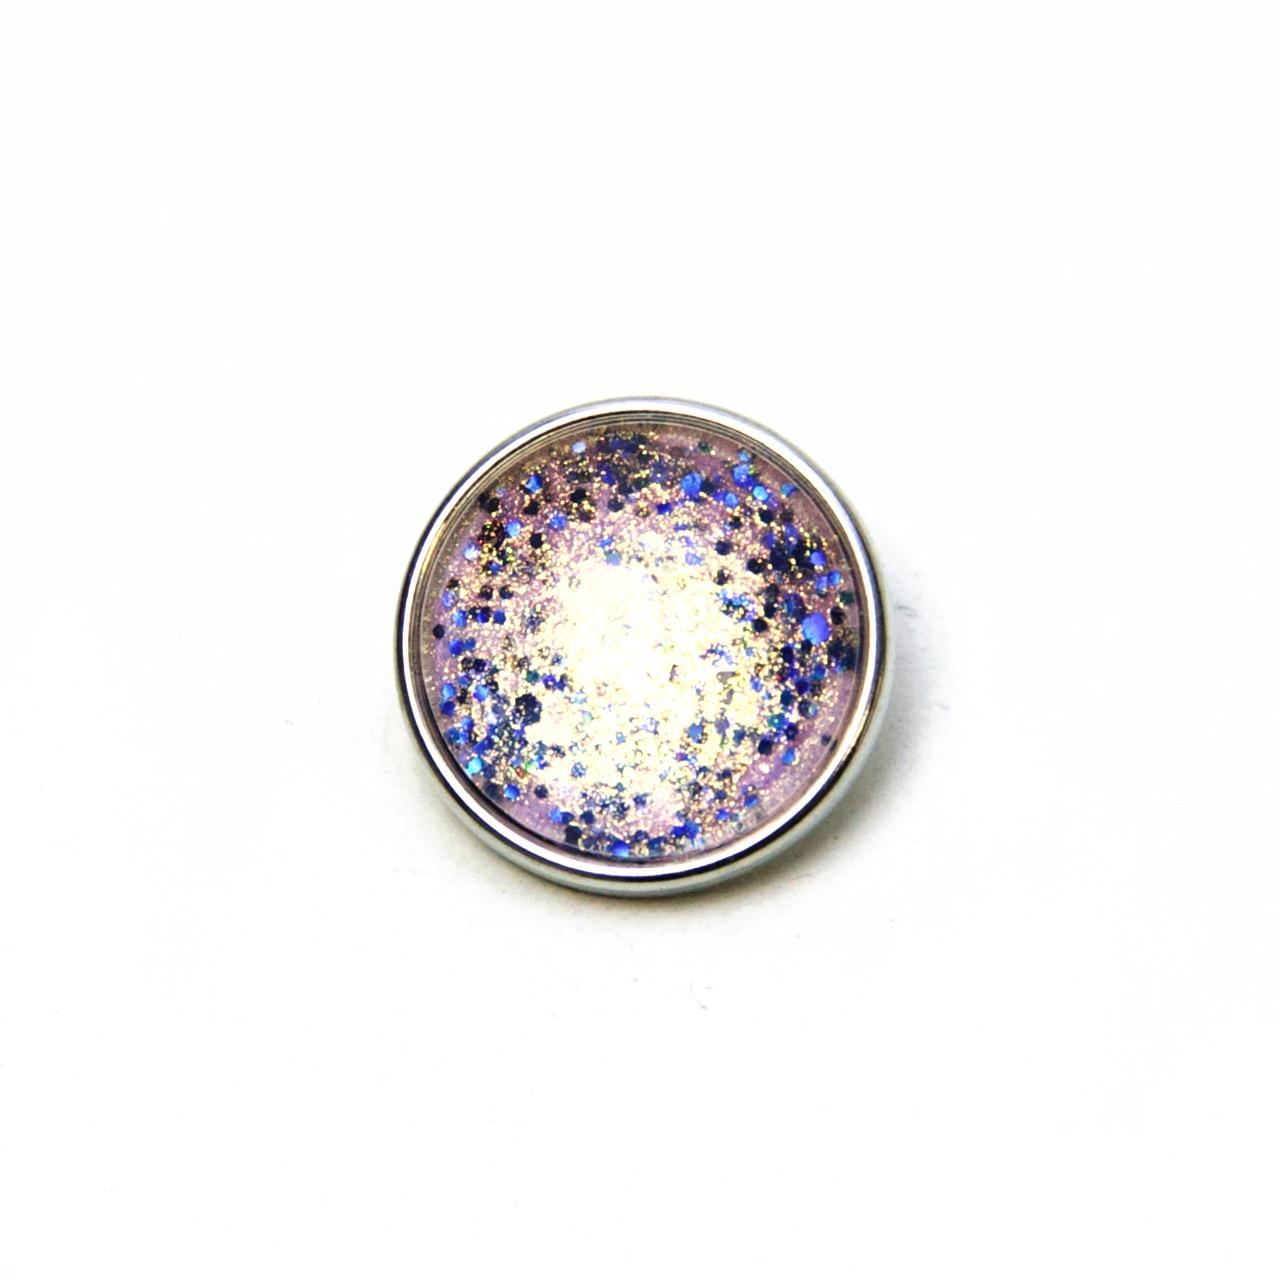 Druckknopf handbemalt Discofever blau rosa glitzernd